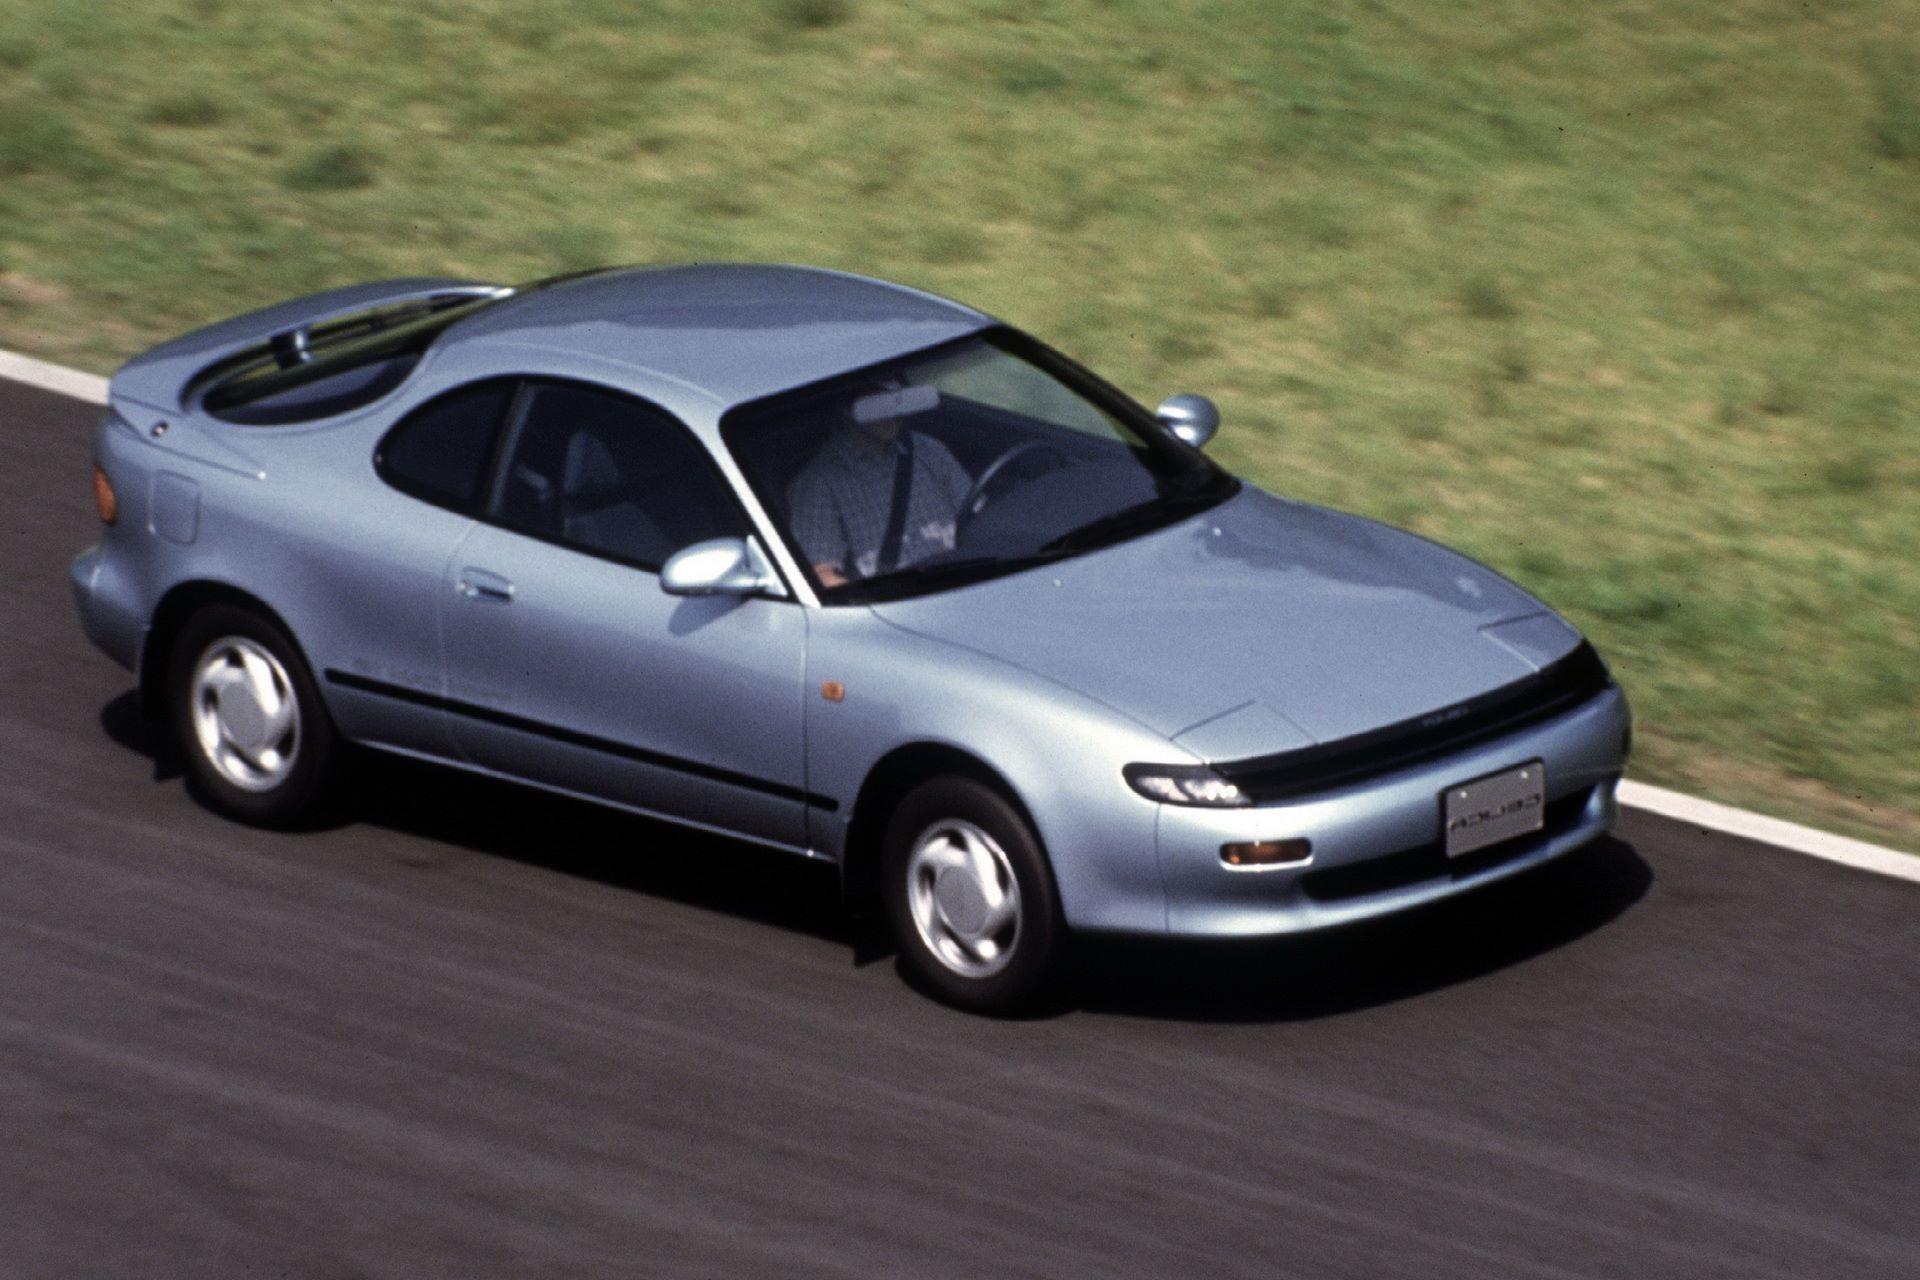 Toyota-Celica-50-years-18